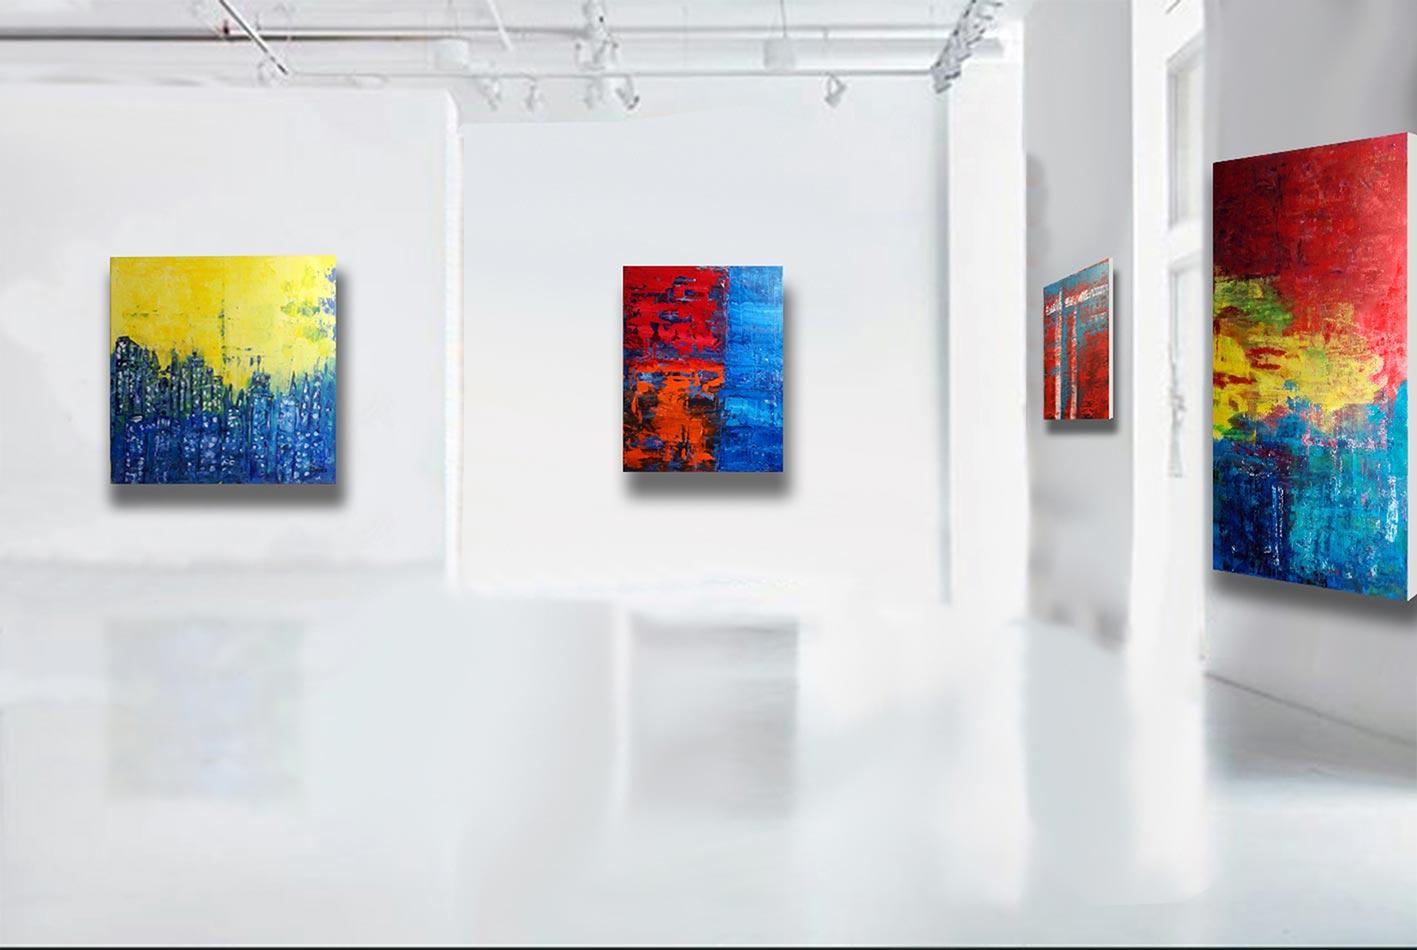 Patrick-Joosten-Triptych-2019–Feb-13th-90x70cm-expo